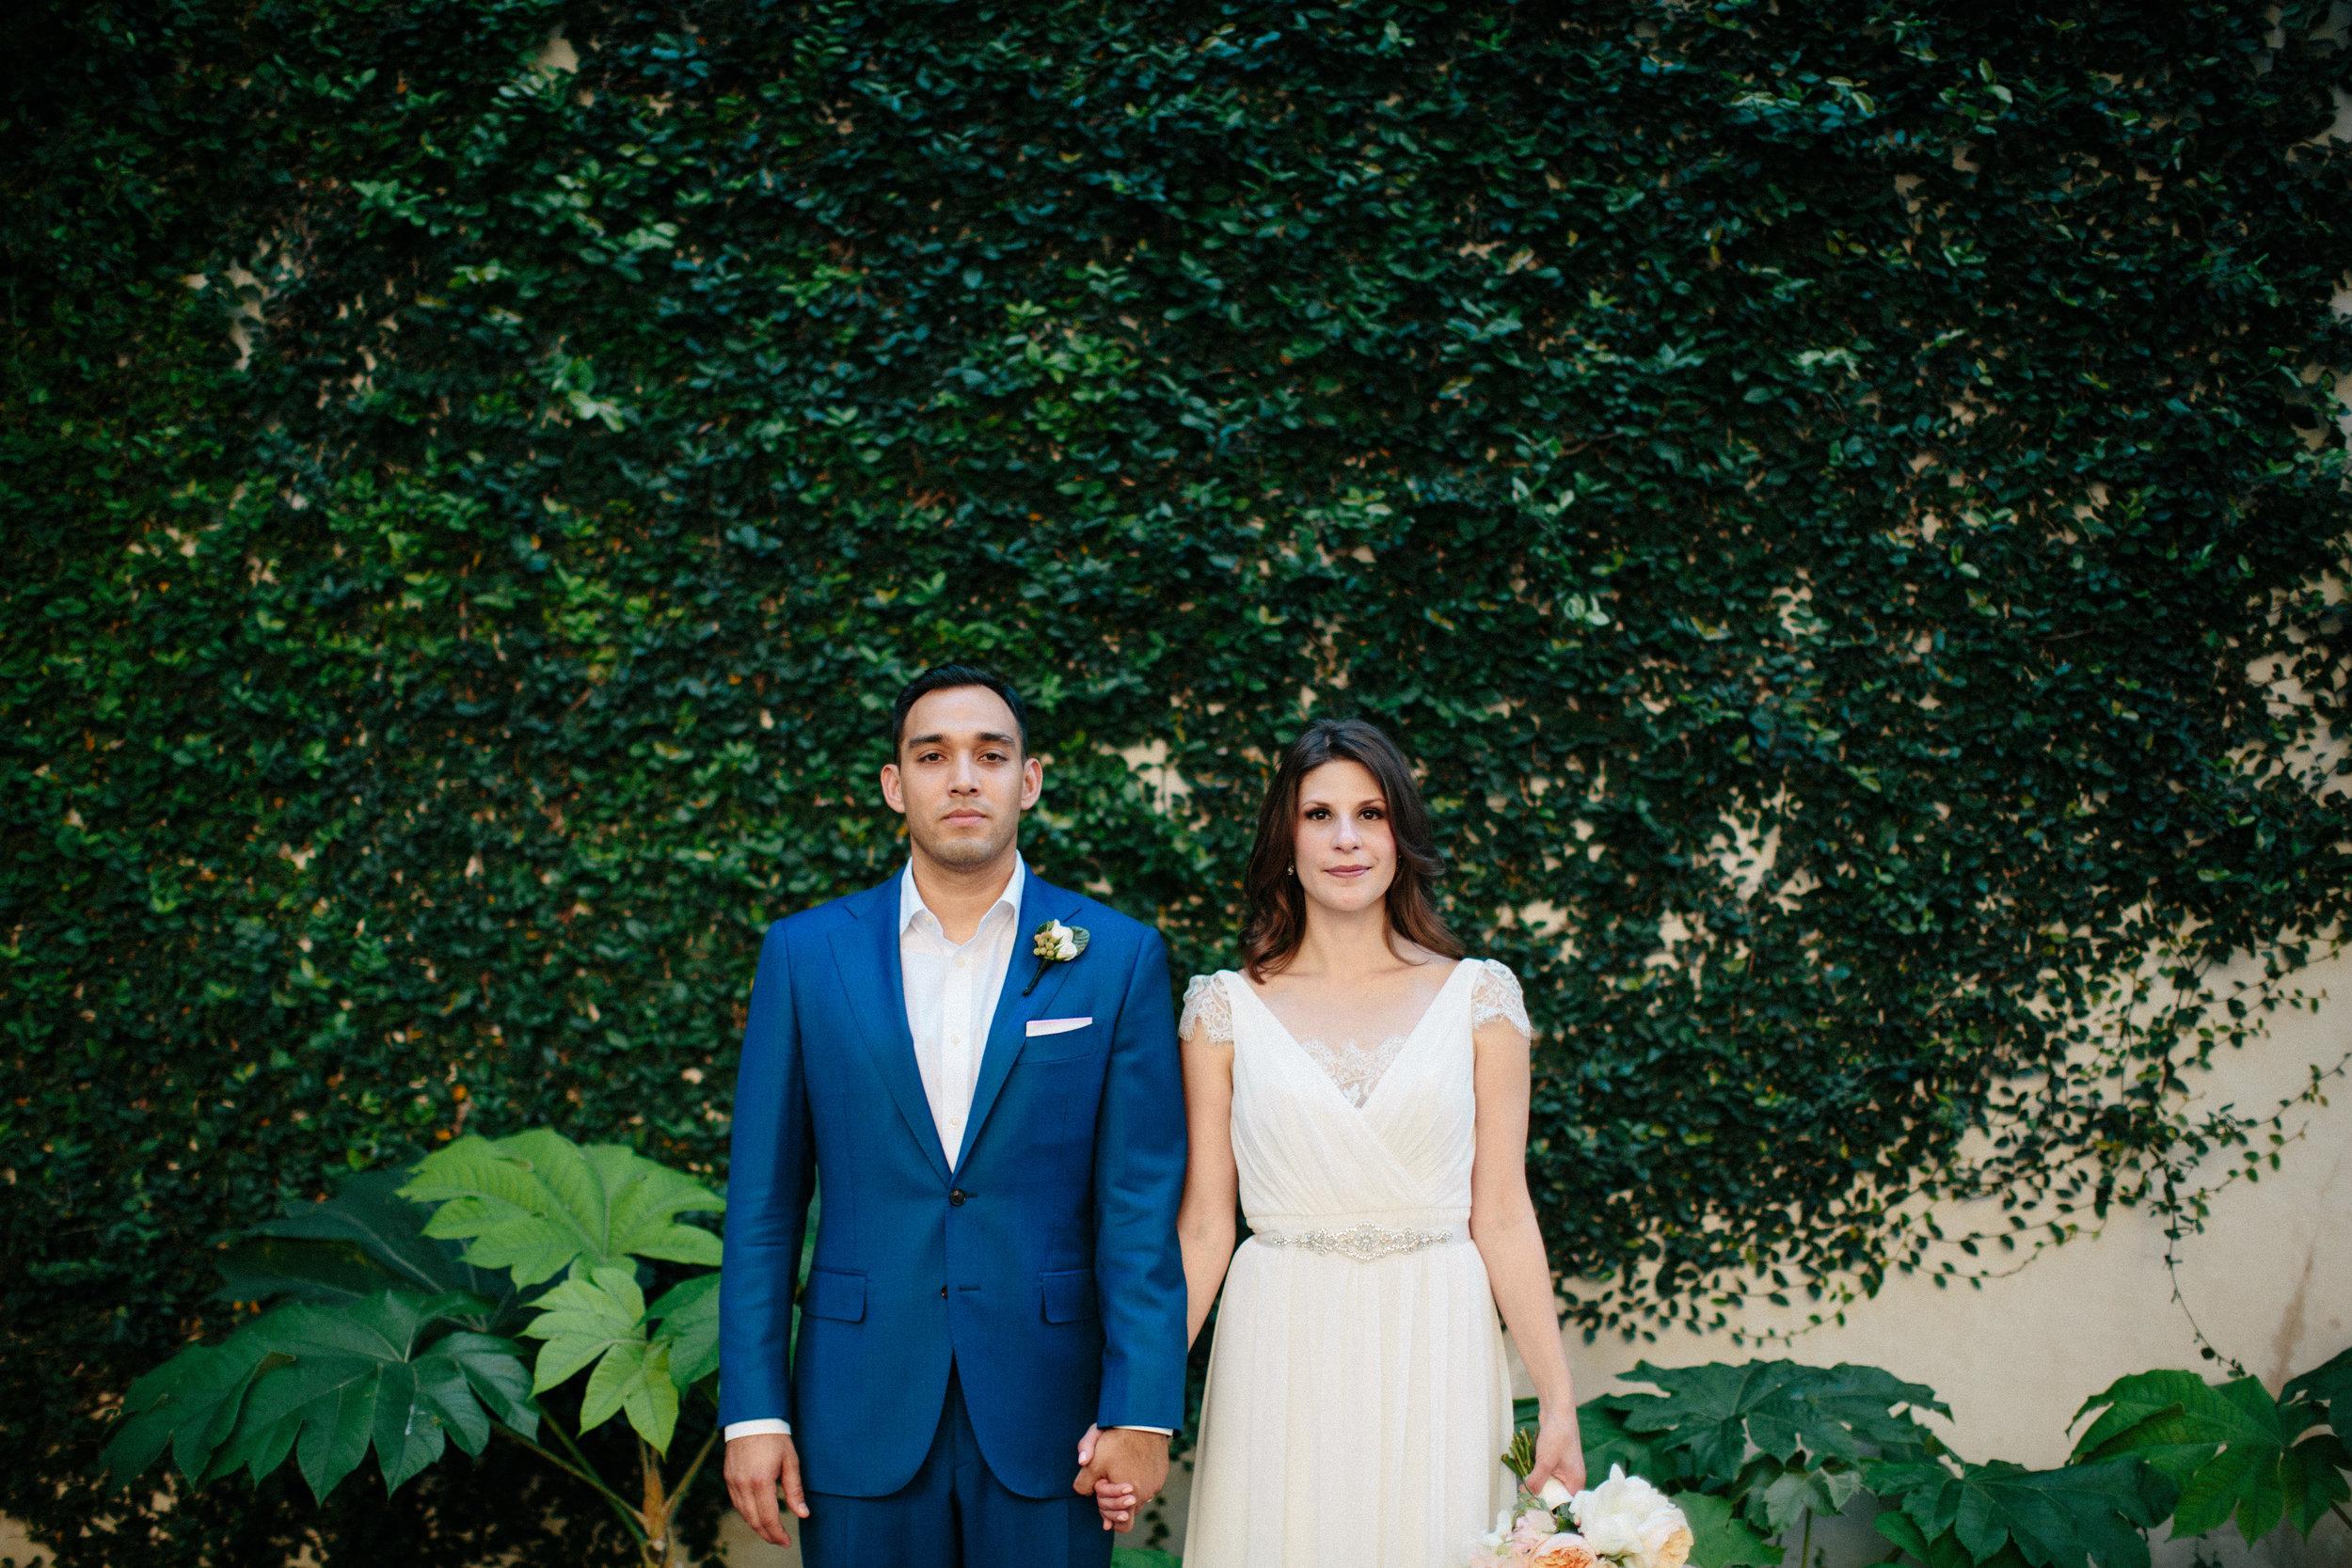 Paige-Newton-Intimate-Wedding-Photography-Downtown-Austin.jpg